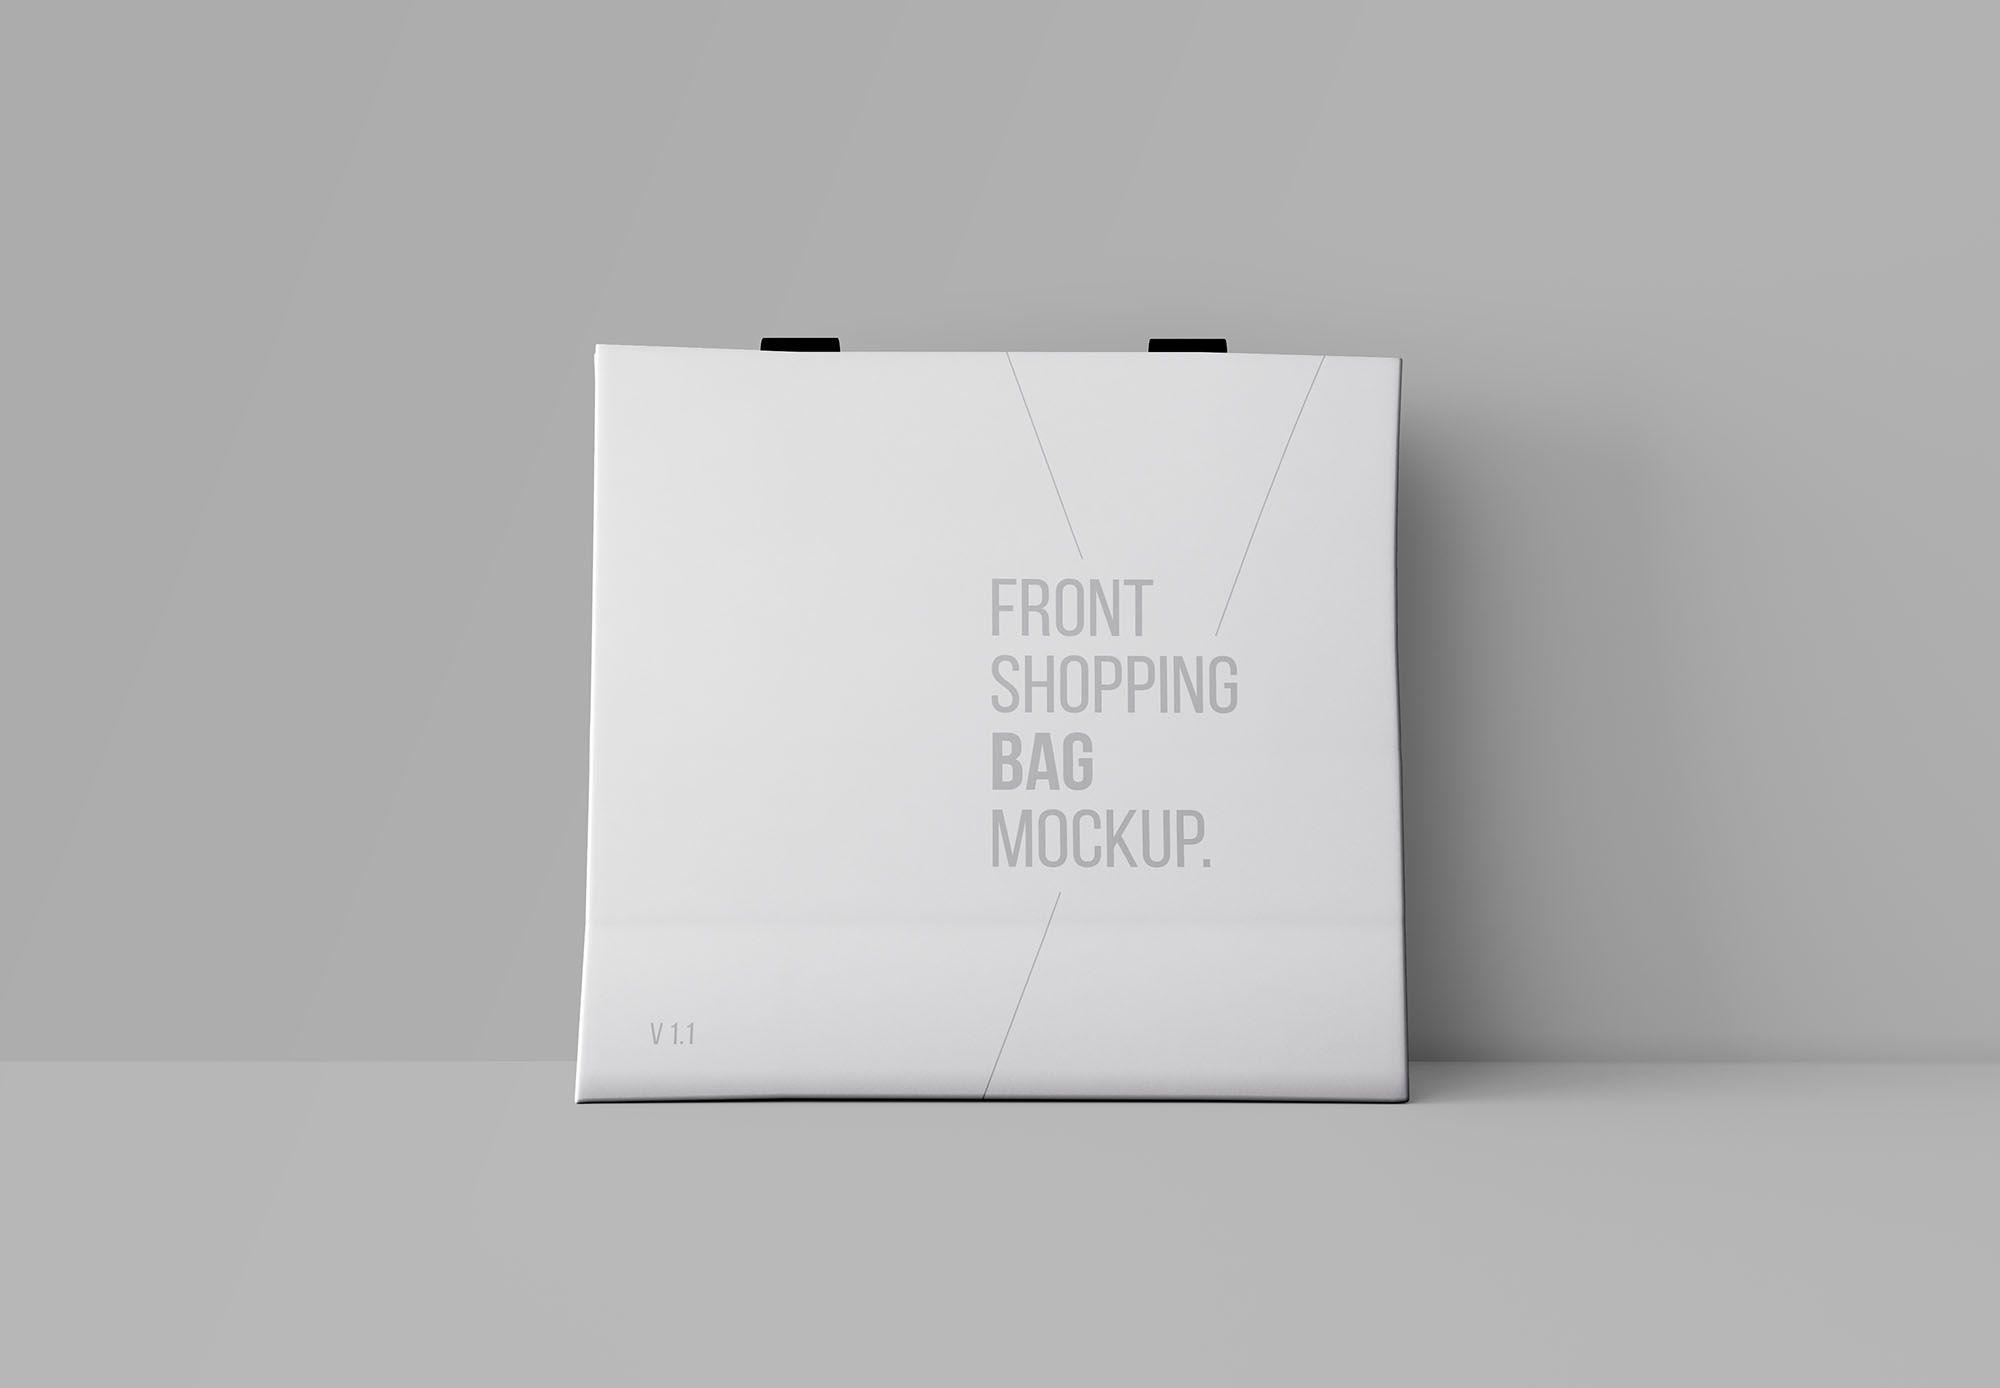 Download Free Front Shopping Bag Mockup Bag Mockup Design Mockup Free Mockup